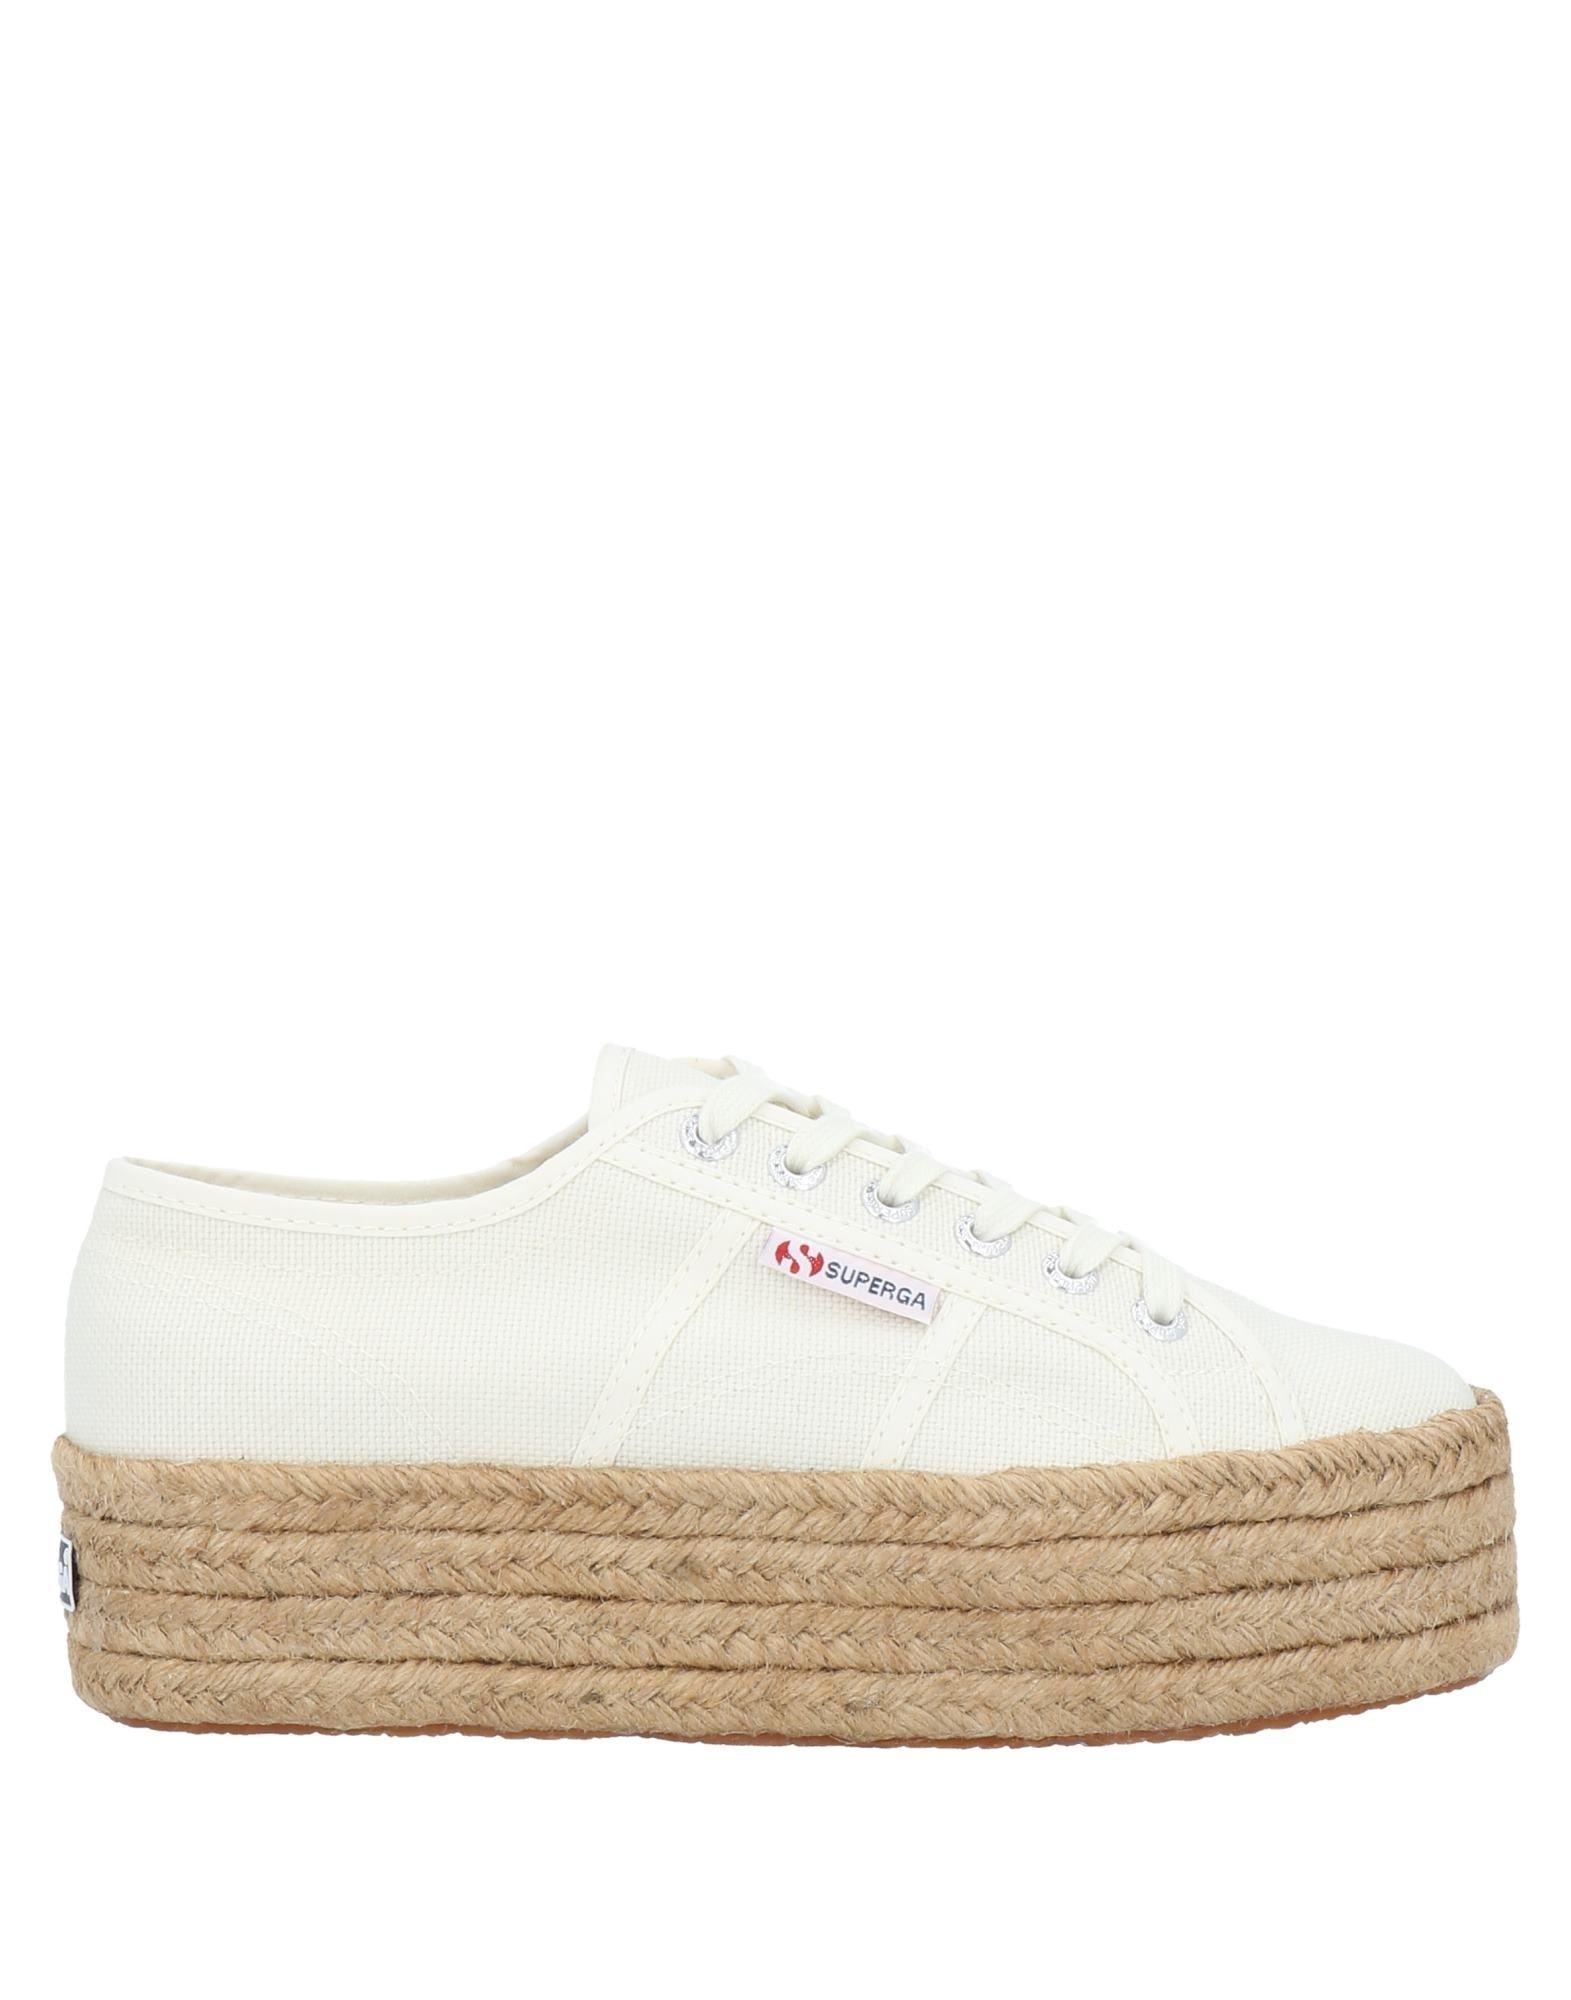 Details about  /NIB SUPERGA 2730 Womens Espadrilles Platform Classic Flat Canvas Casual Shoes